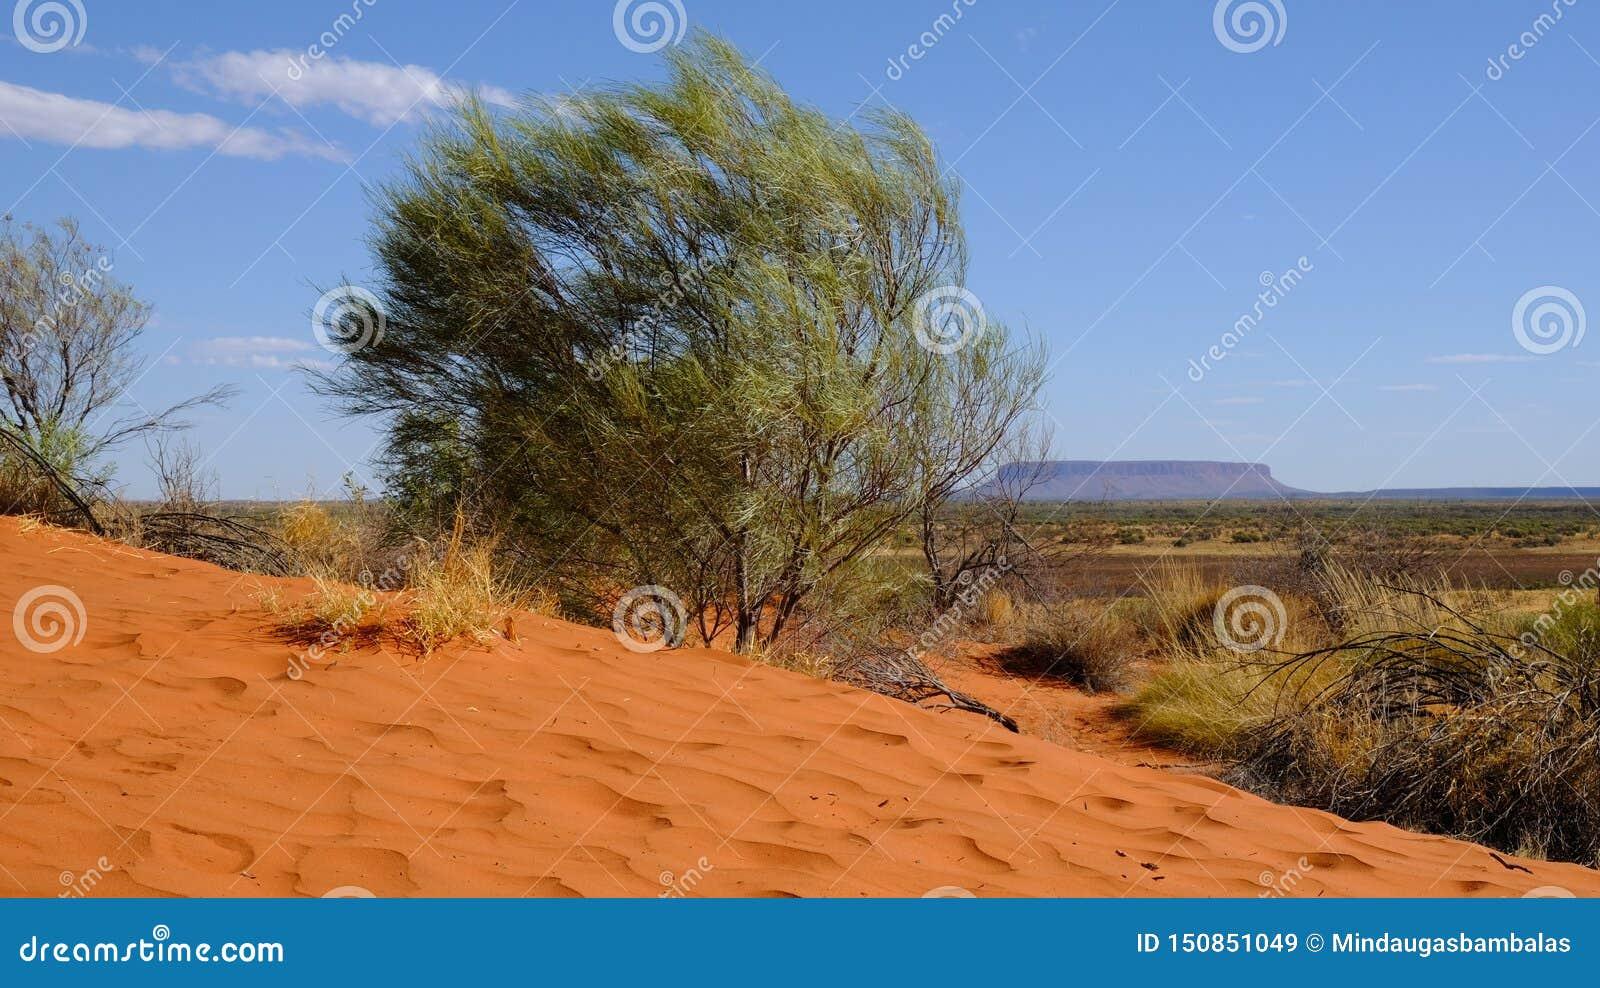 Berg Conner för tabellöverkant i vildmark på horisonten, solig dag i det nordliga territoriet Australien